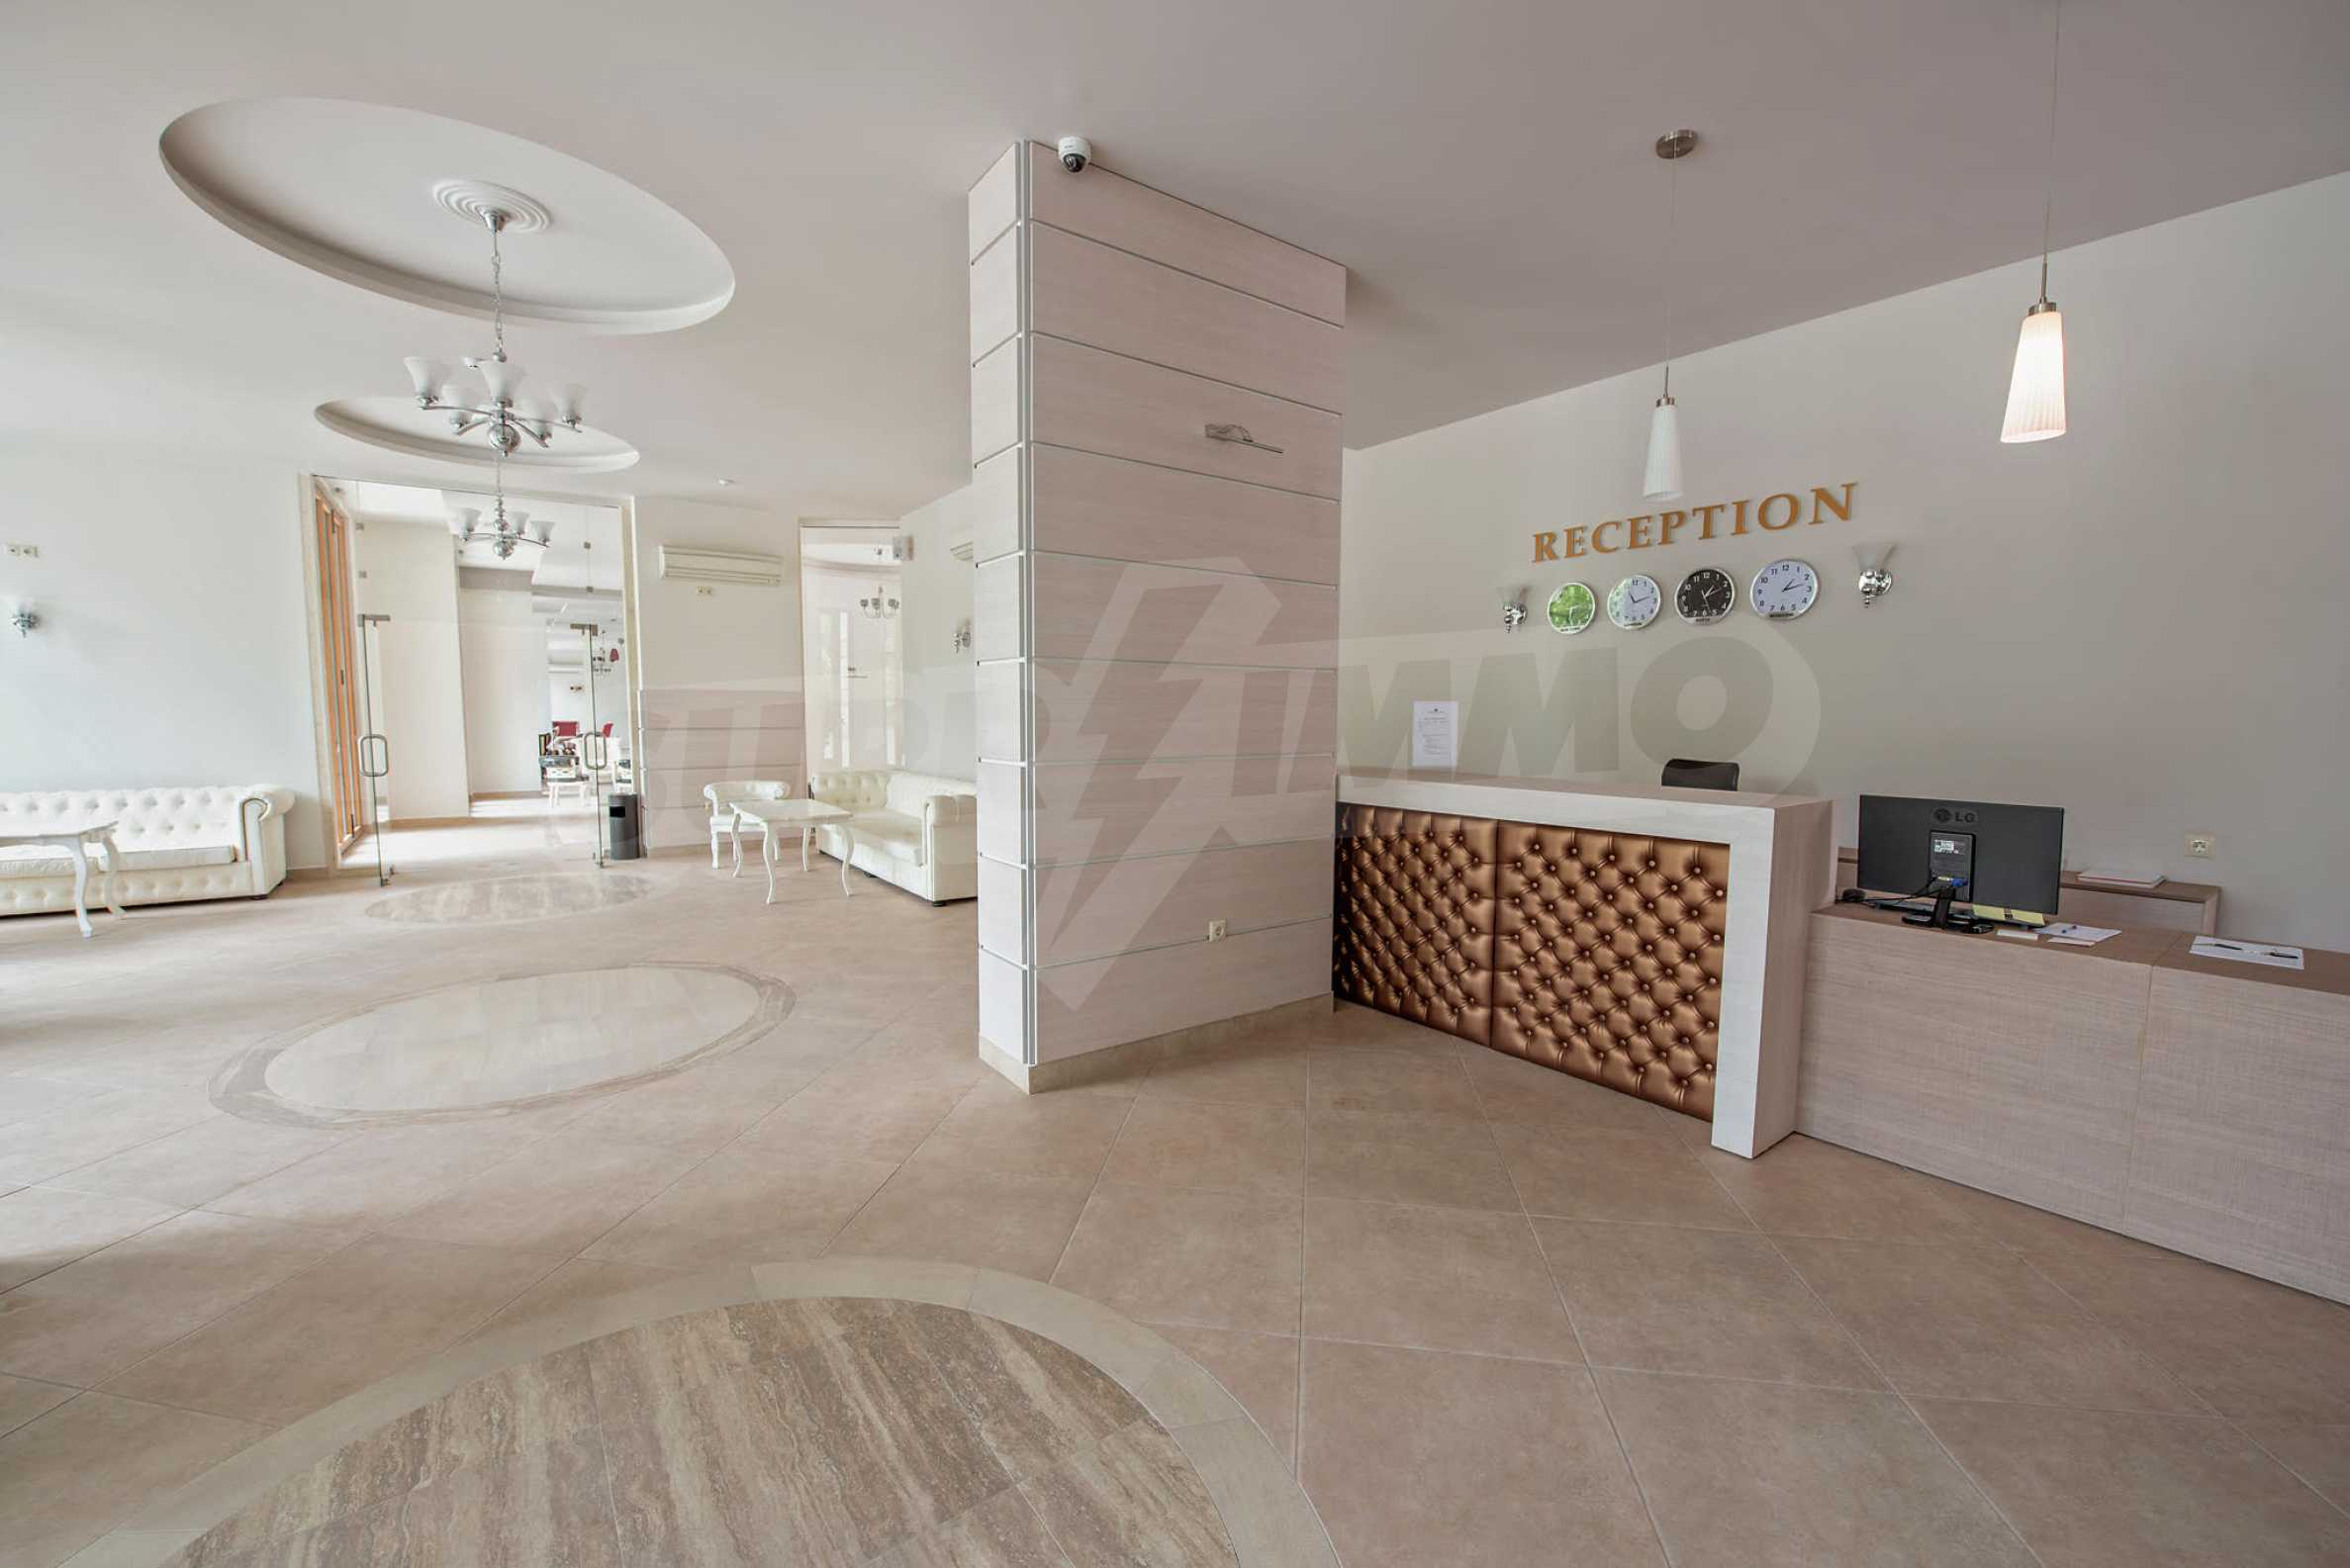 Двустаен апартамент във Варна Саут Бей / Varna South Bay 9